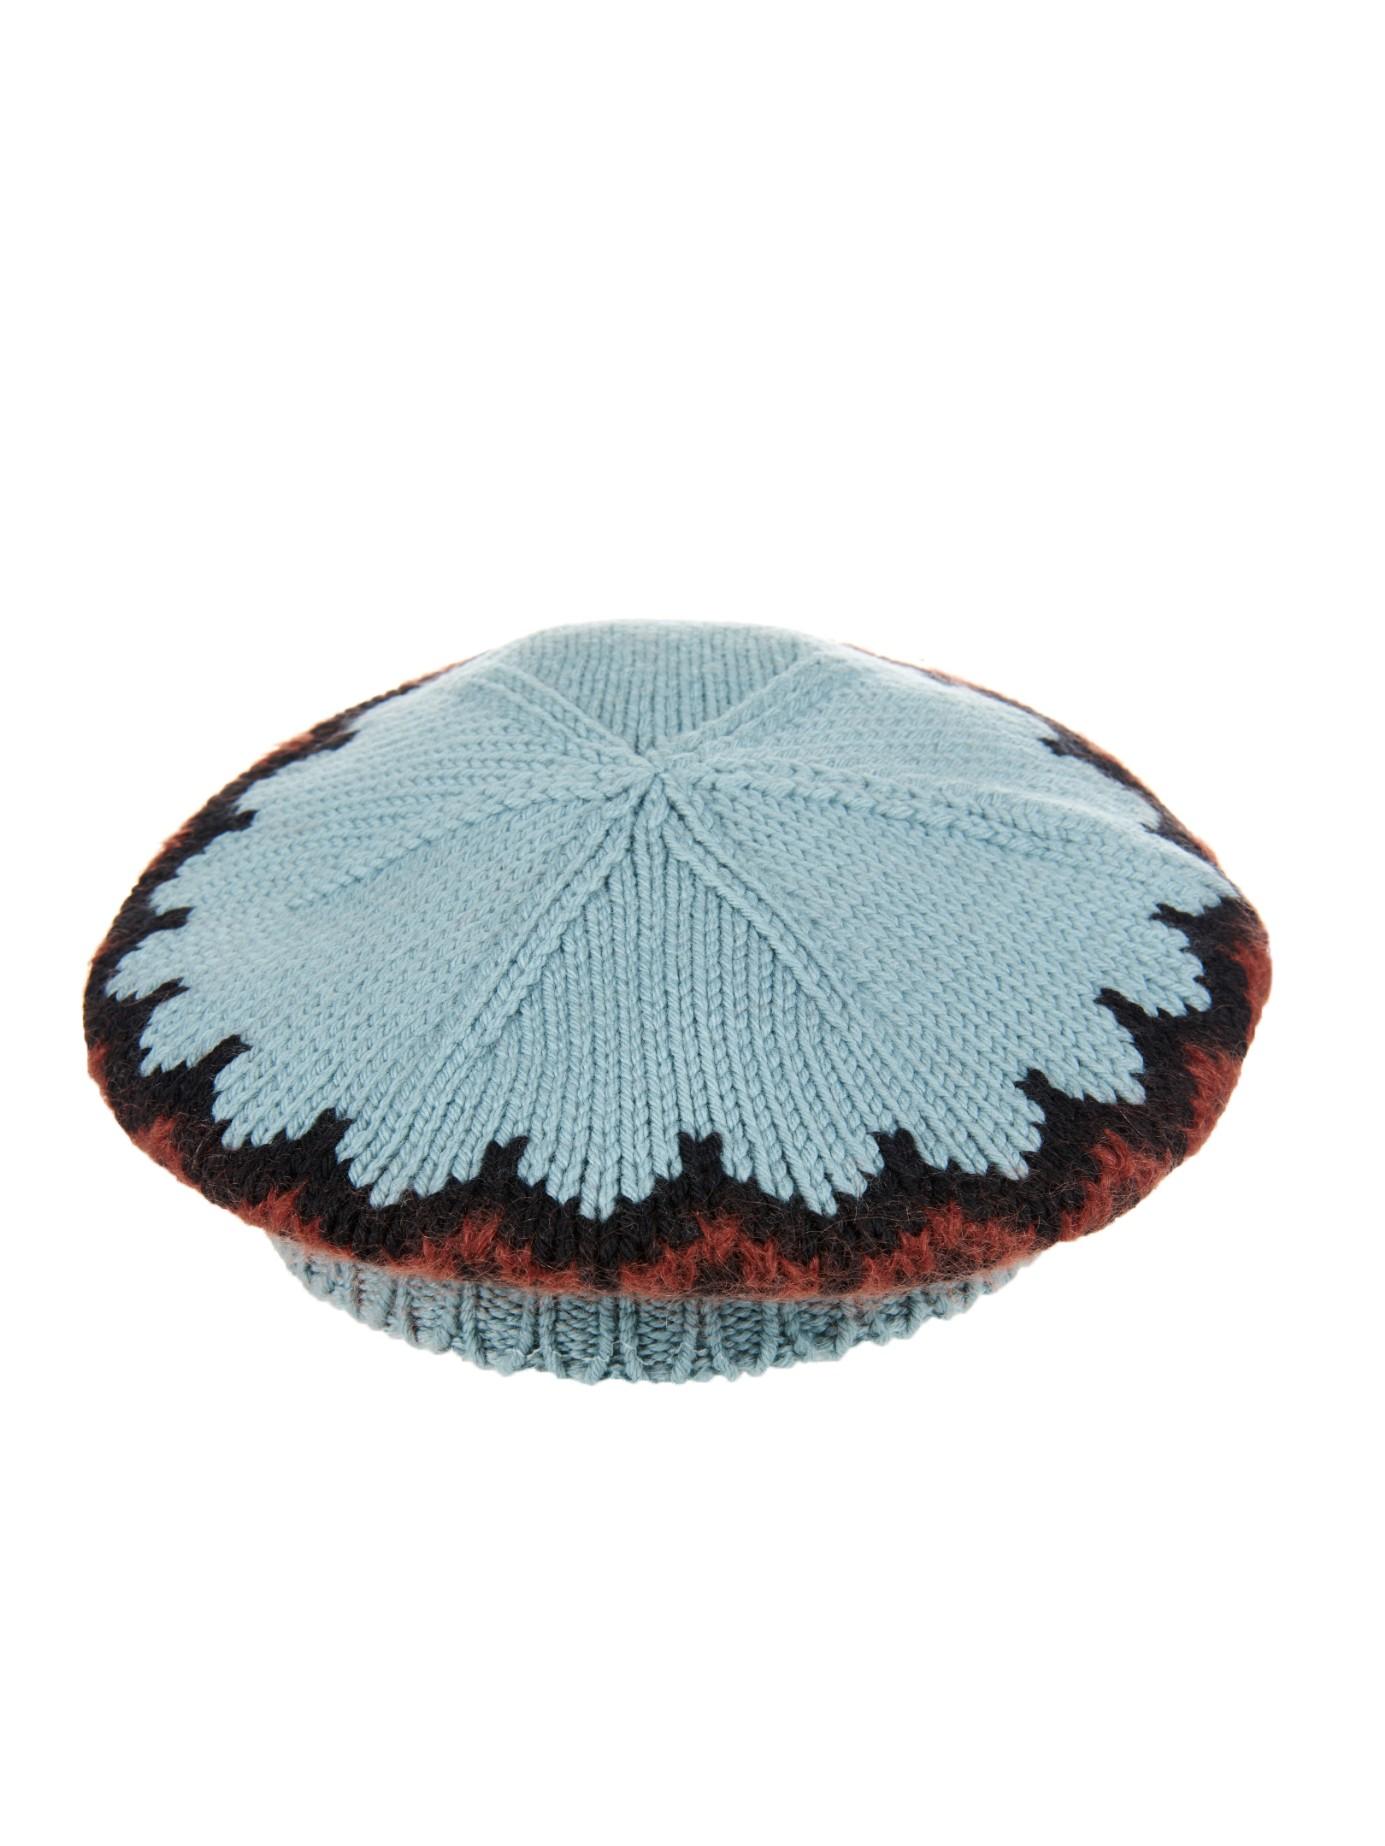 c52f0b1ef286b Gucci Umbrella Hat